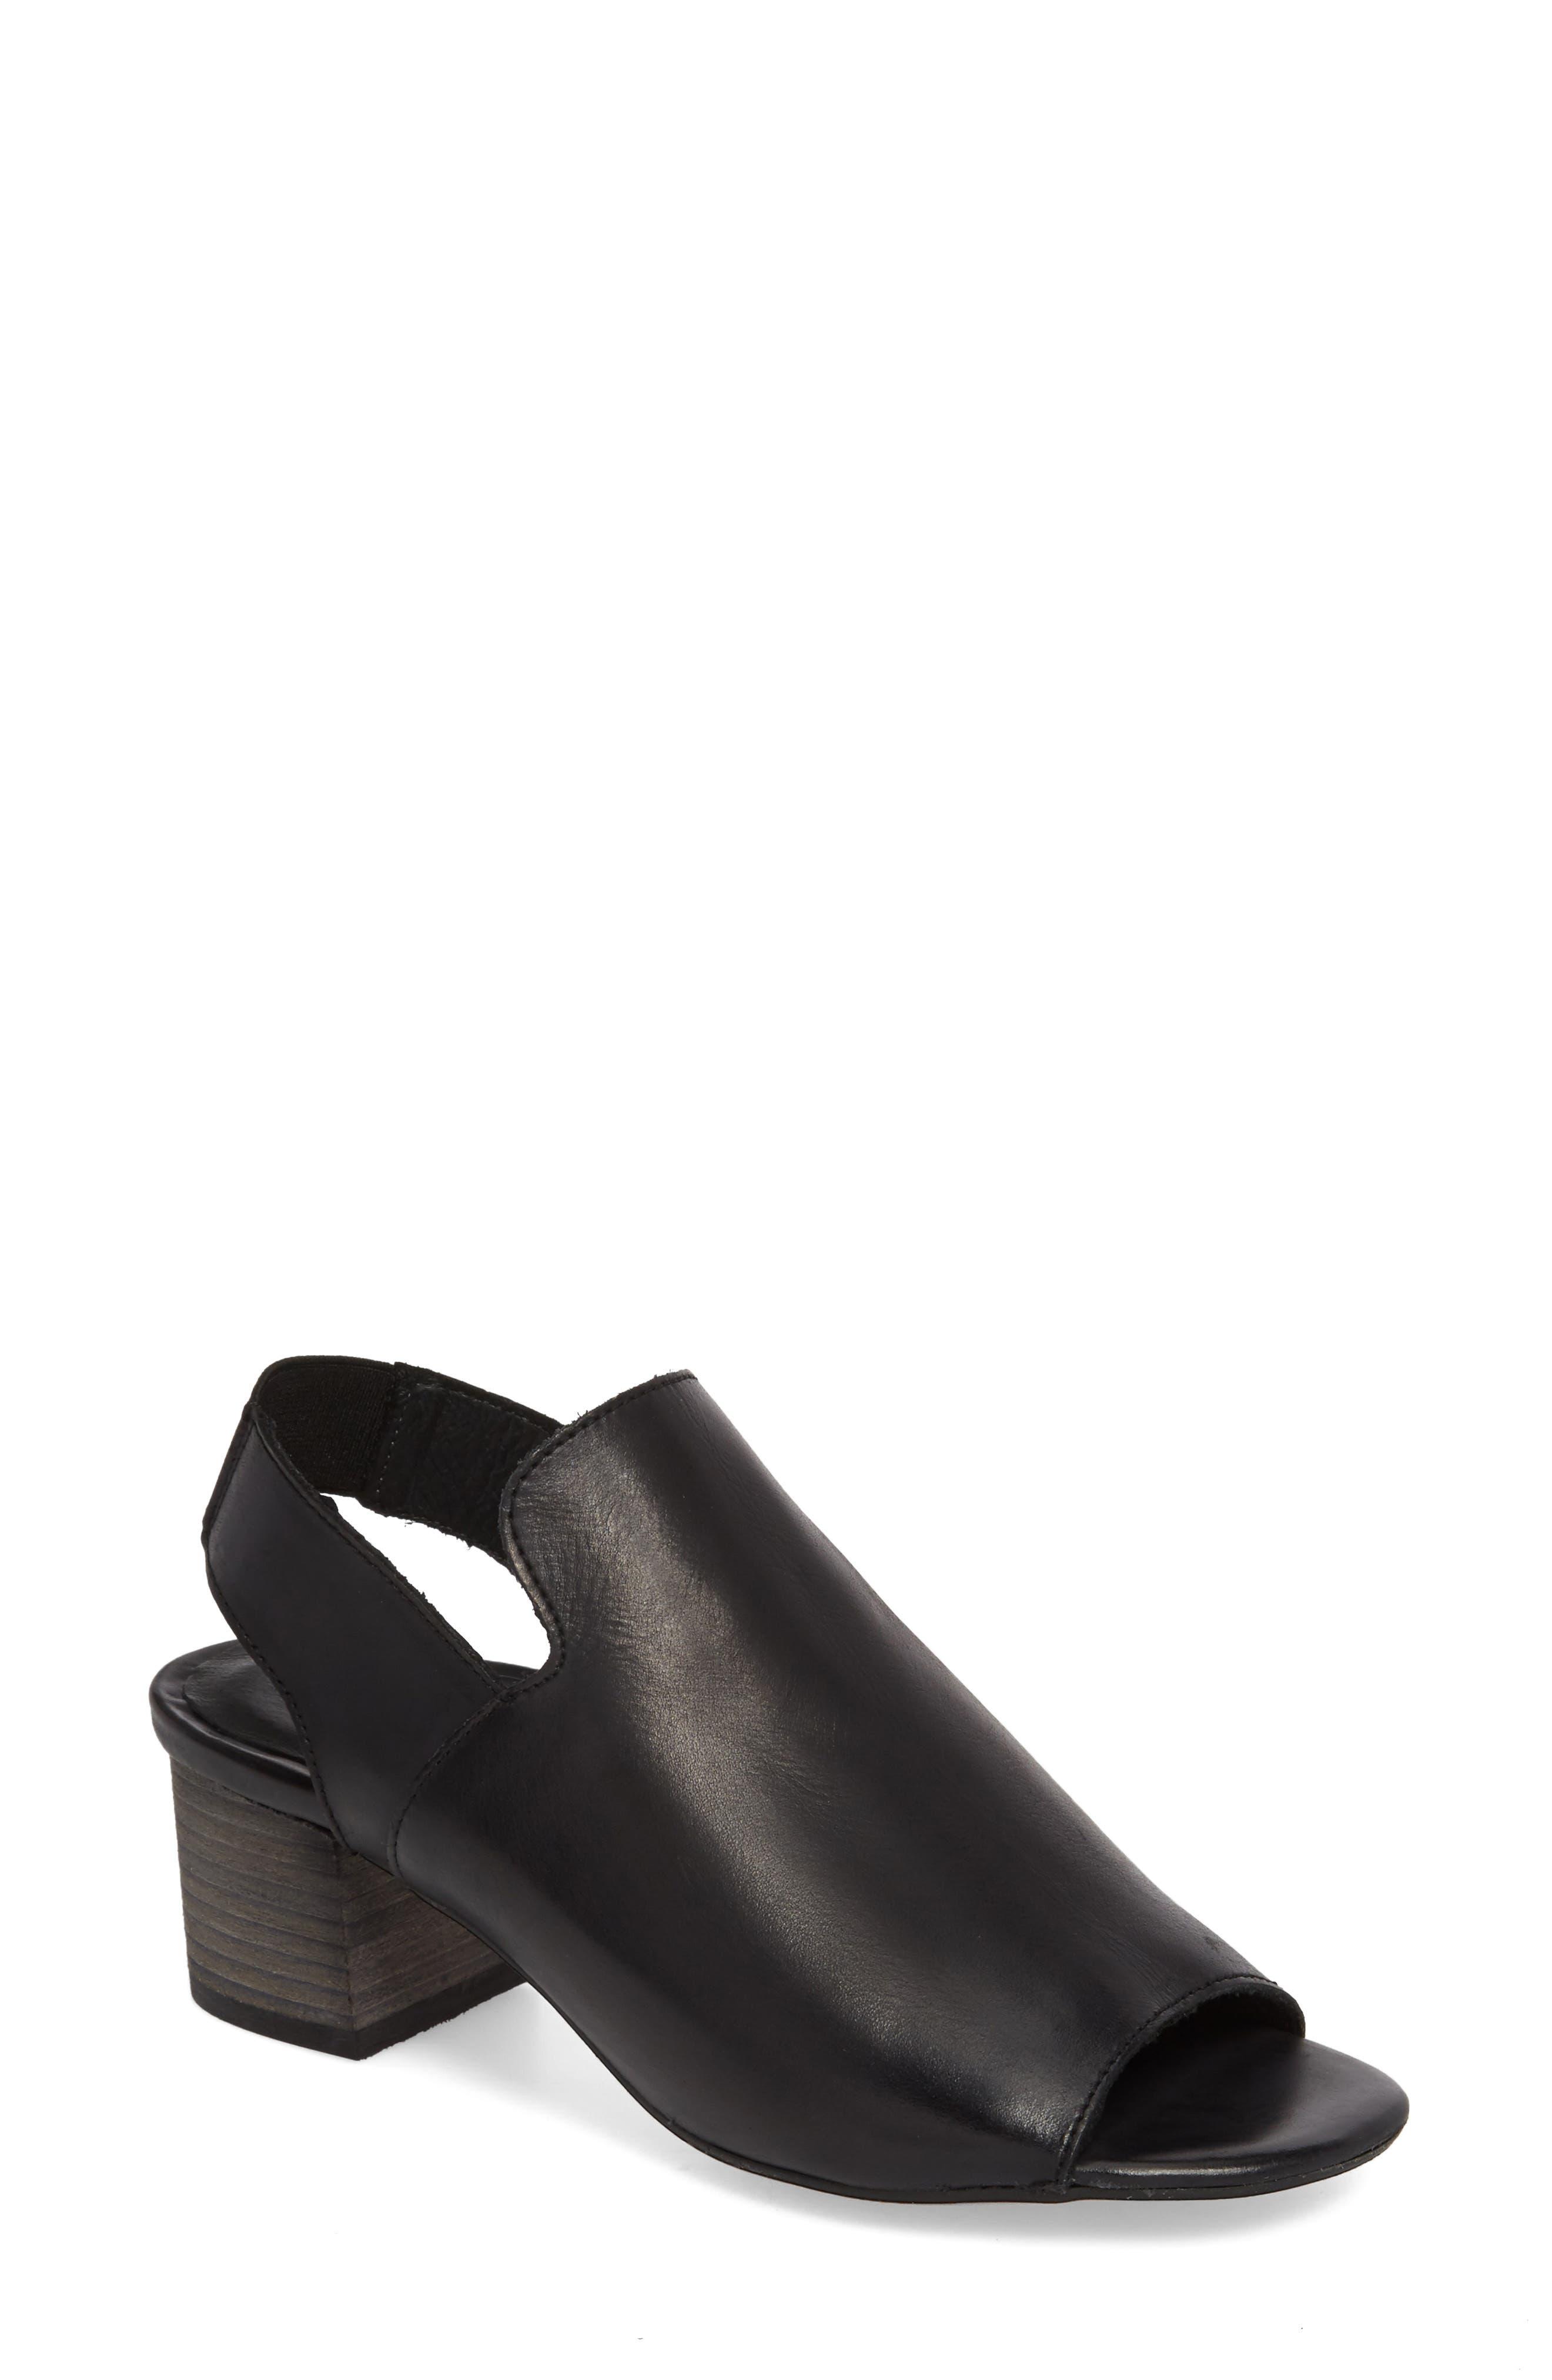 BOS. & CO., Zaire Slingback Sandal, Main thumbnail 1, color, BLACK GLAMOUR LEATHER